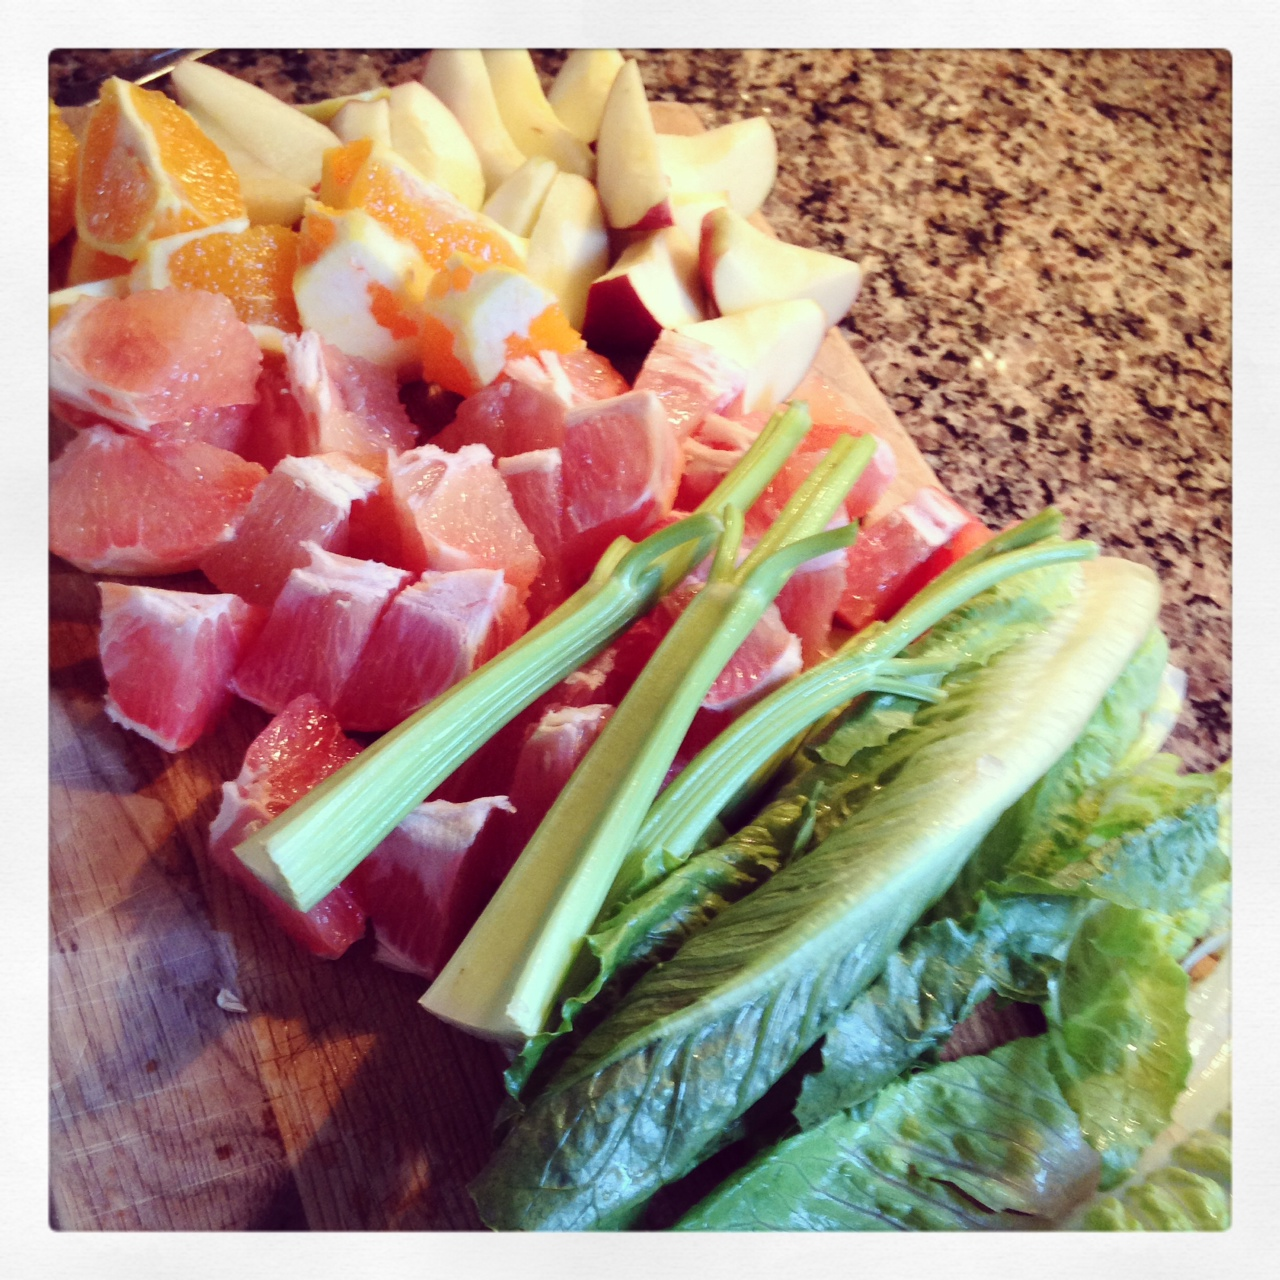 My first morning juice: apple, grapefruit,  orange, celery and romaine.